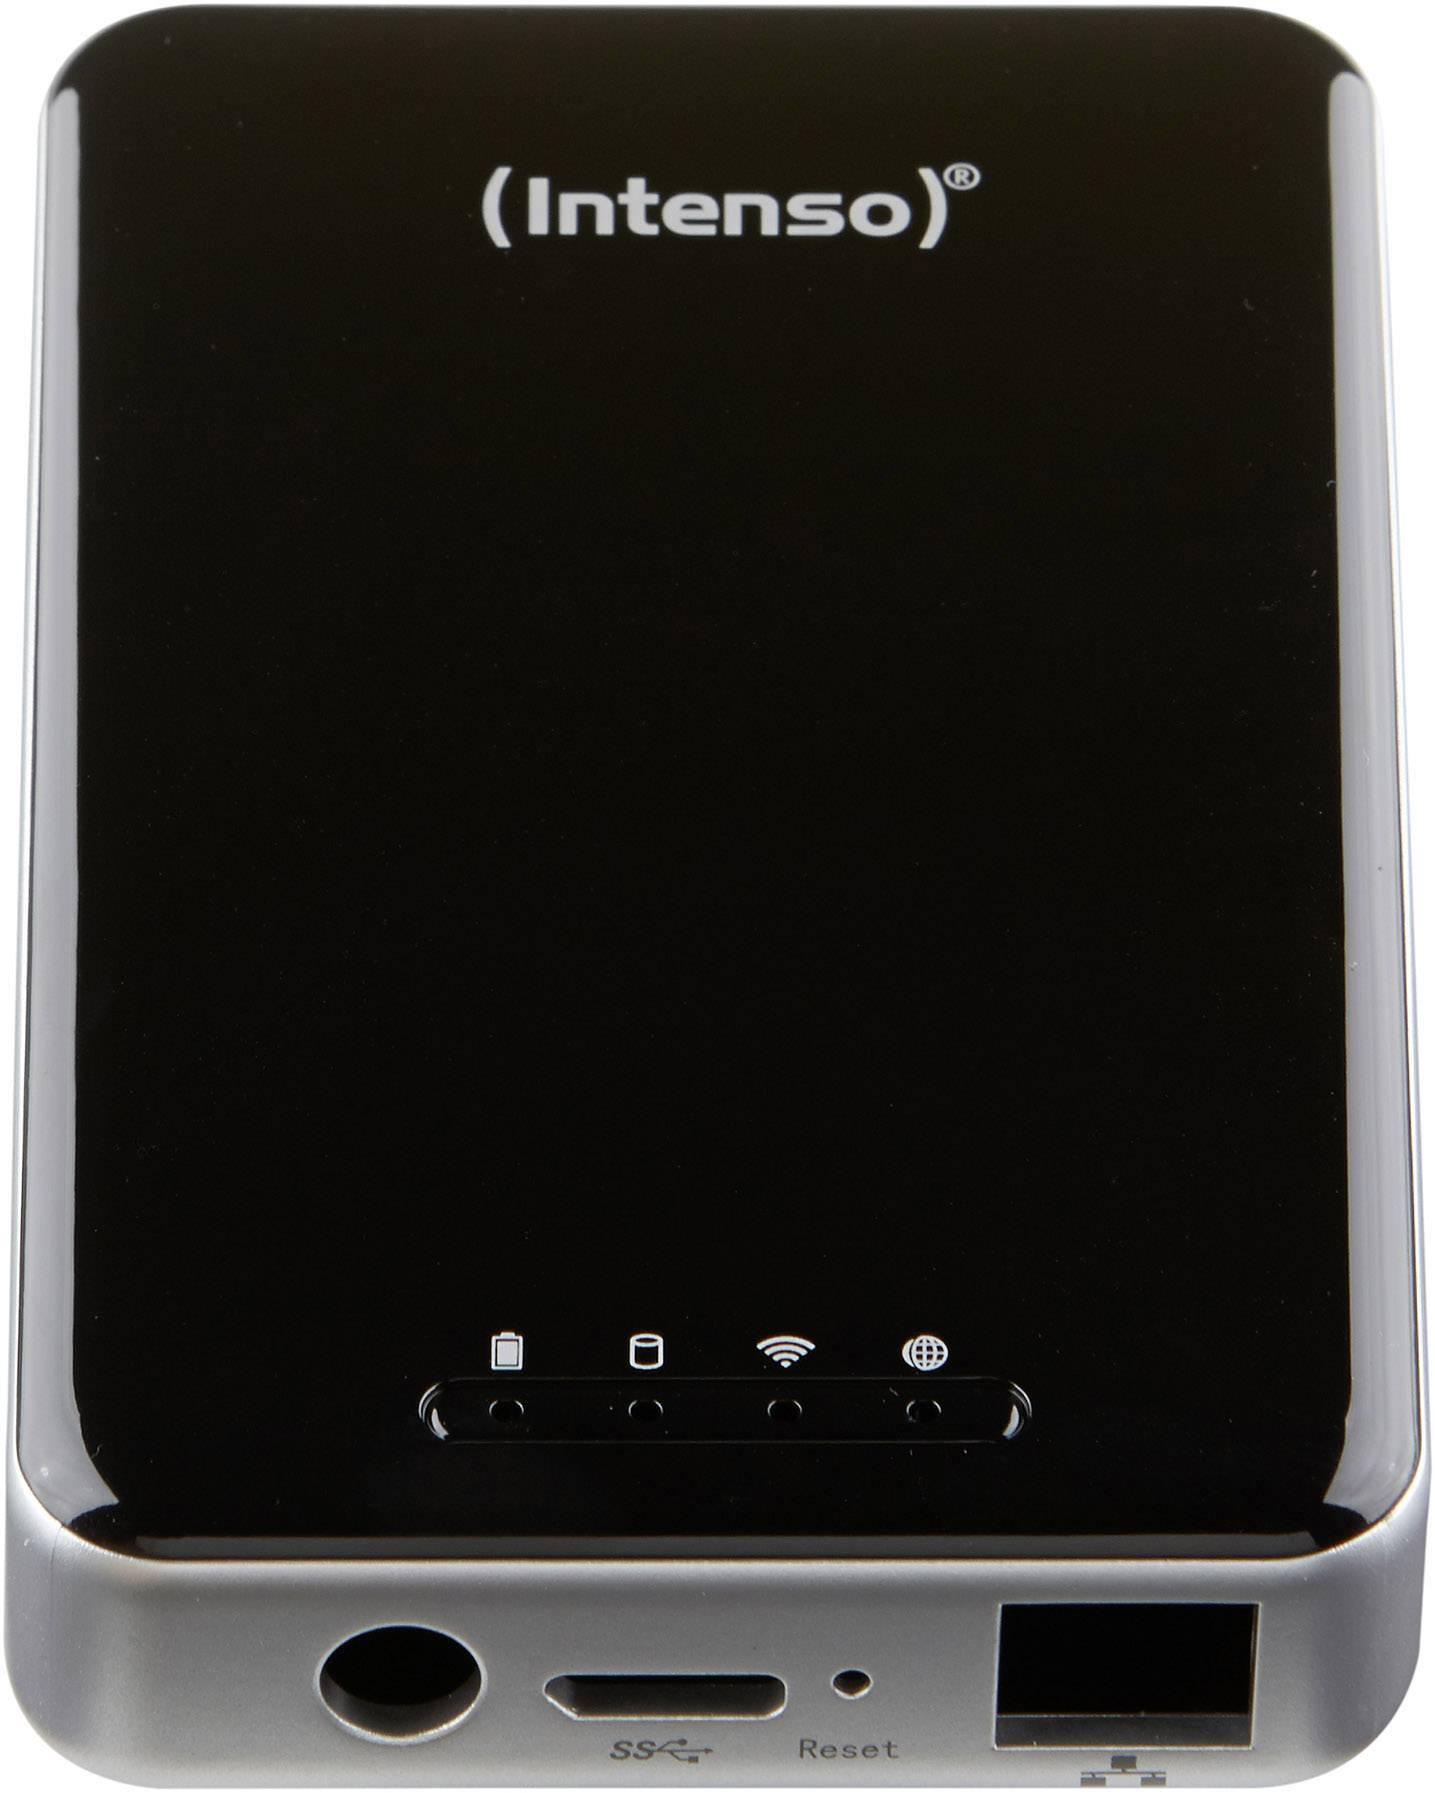 Wi-Fi pevný disk Intenso 6025860, 1 TB, USB 3.0, LAN (10/100 Mbit / s), Wi-Fi 802.11 b/g/n, čierna